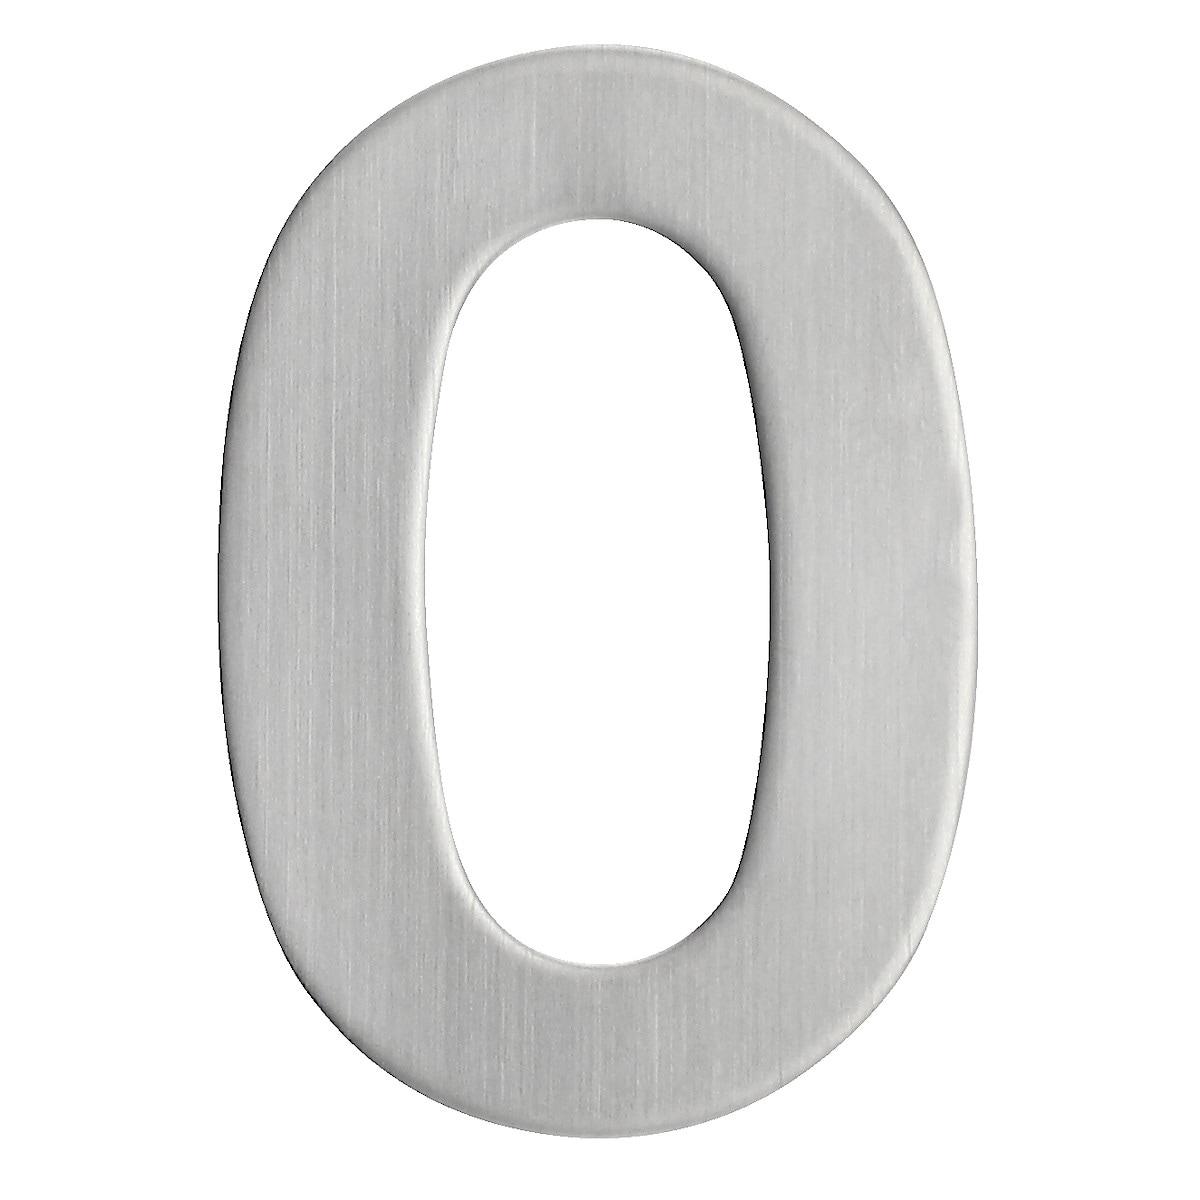 Brevlådenummer